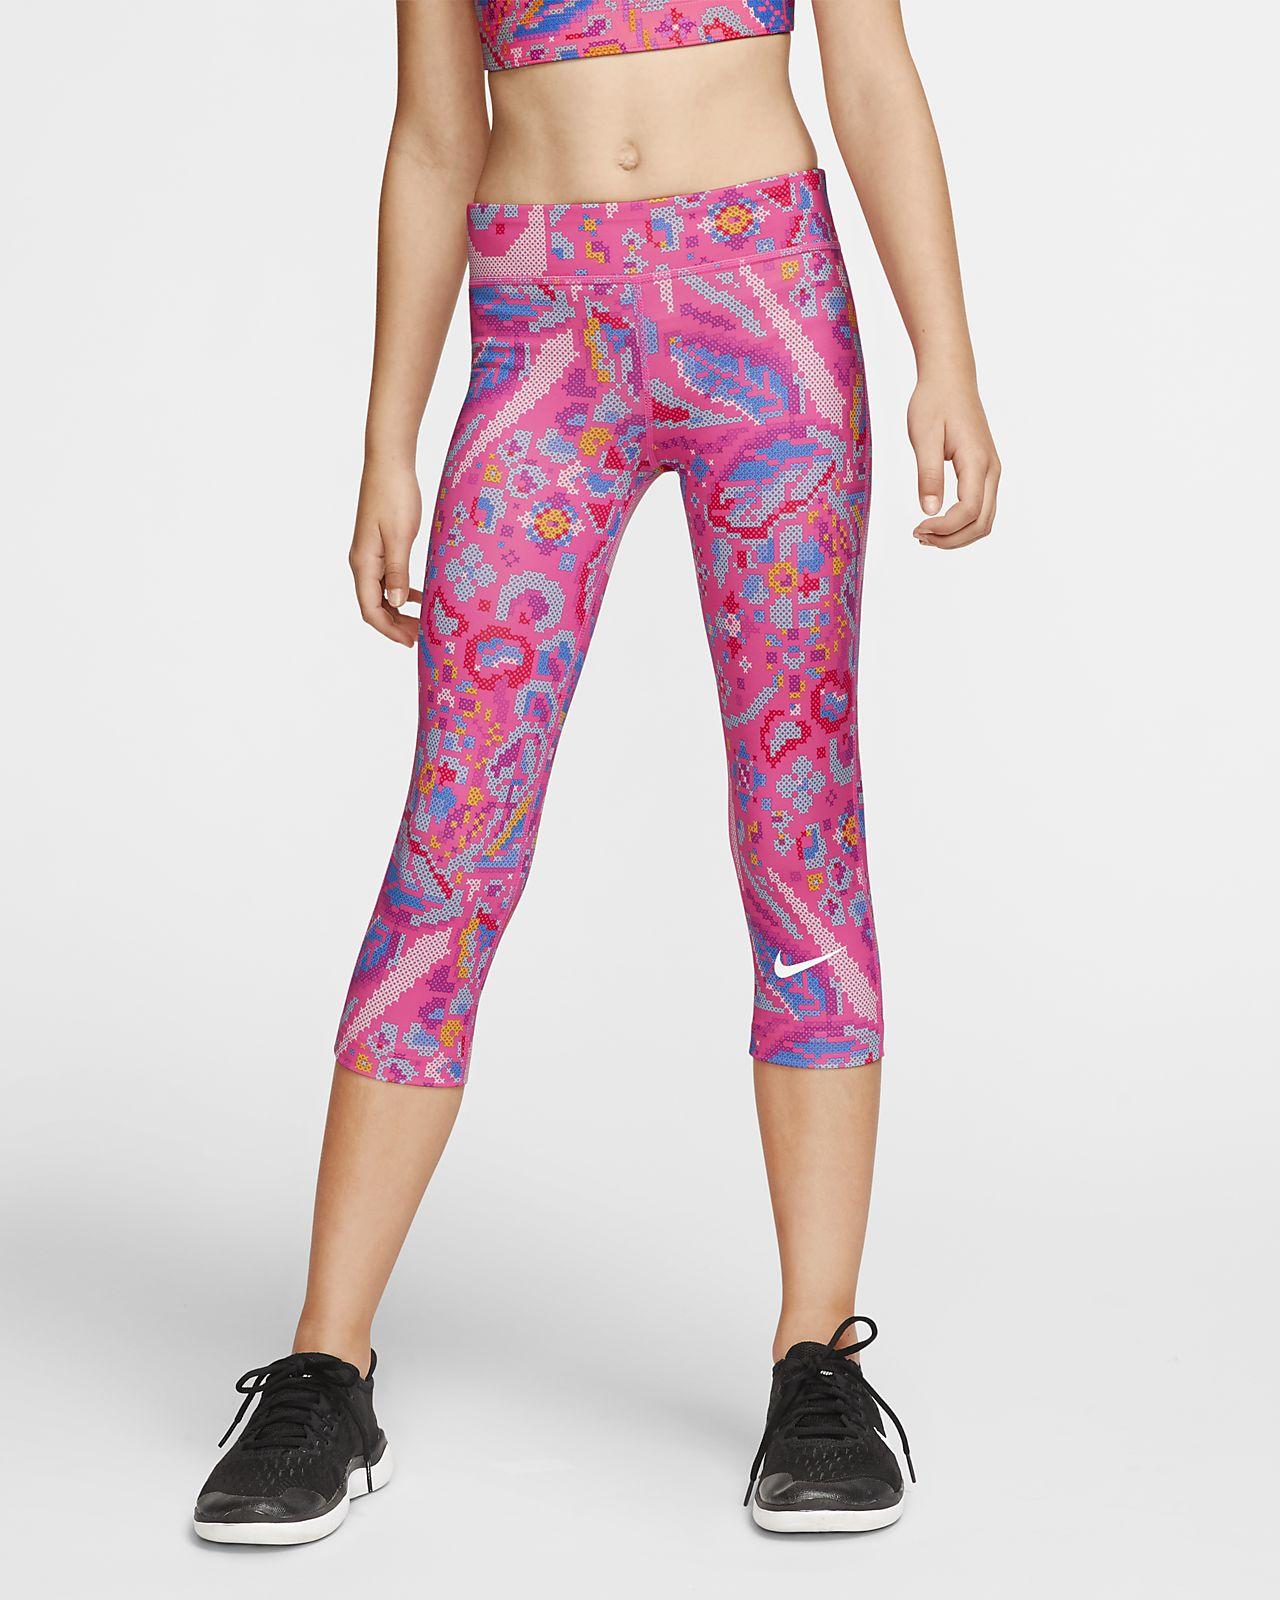 Nike One Caprihose für ältere Kinder (Mädchen)